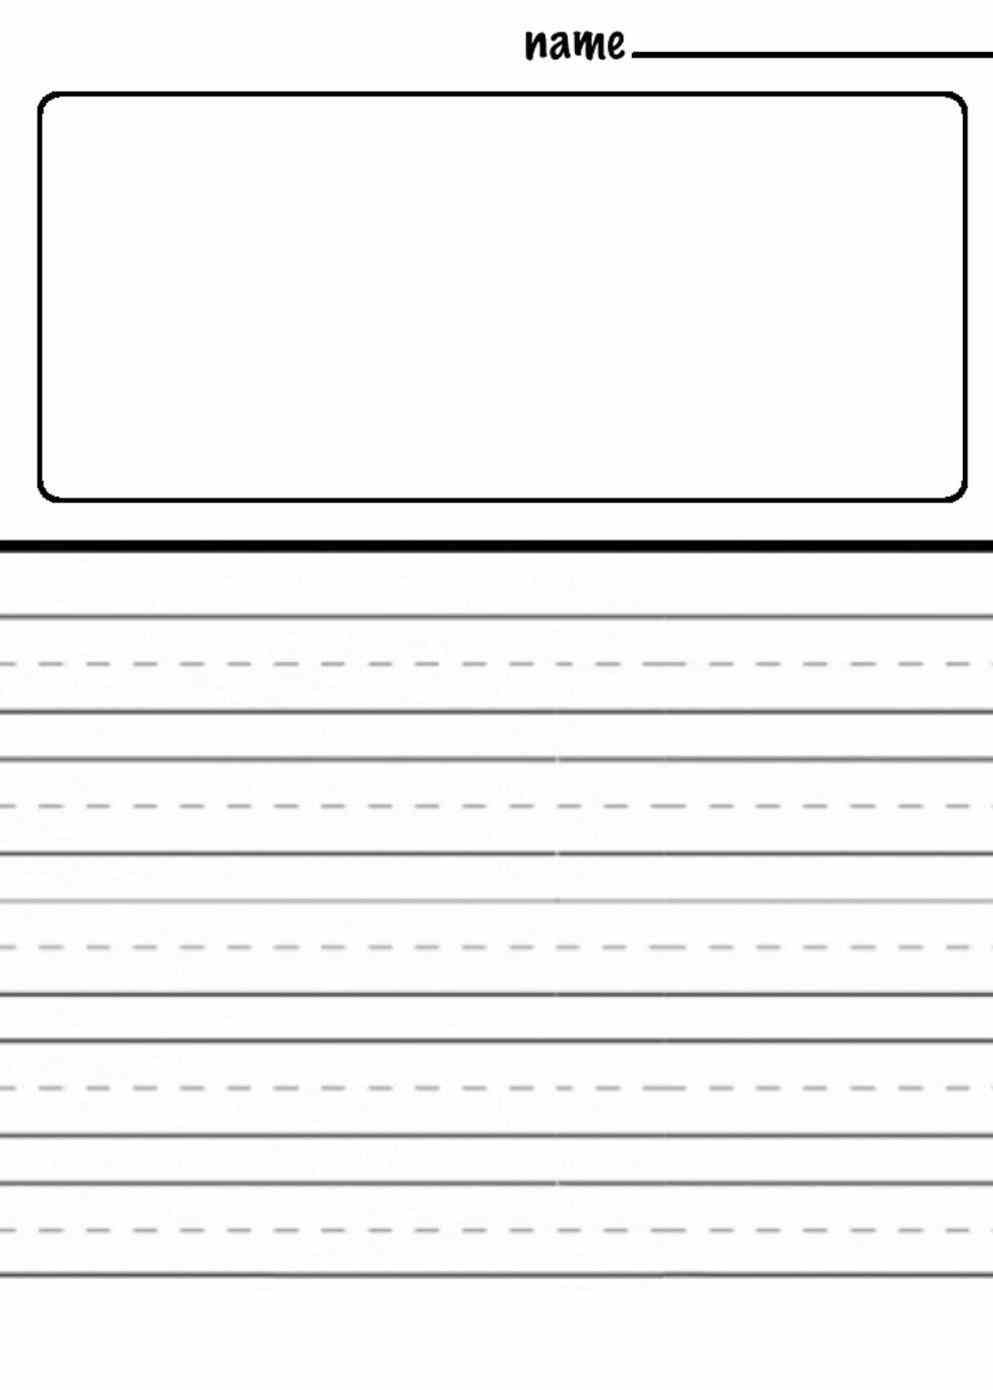 Charming Kindergarten Handwriting Paper Template Gallery Entry - Free Printable Kindergarten Lined Paper Template